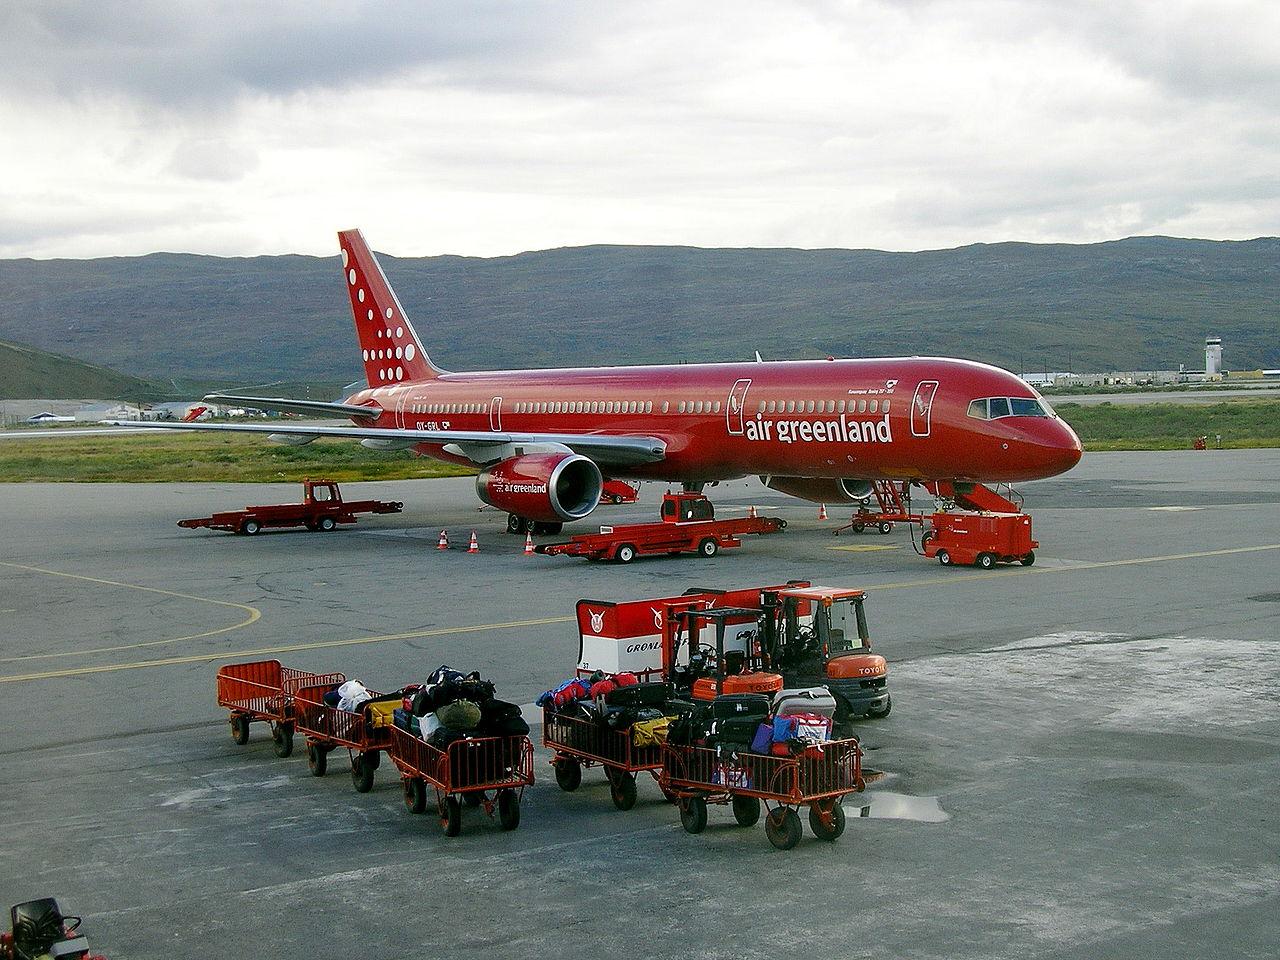 4 1 - Аэропорт Кангилиннгуит (Heliport) коды IATA: JGR ICAO: BGGD город: Кангилиннгуит (Groennedal) страна: Гренландия (Greenland)